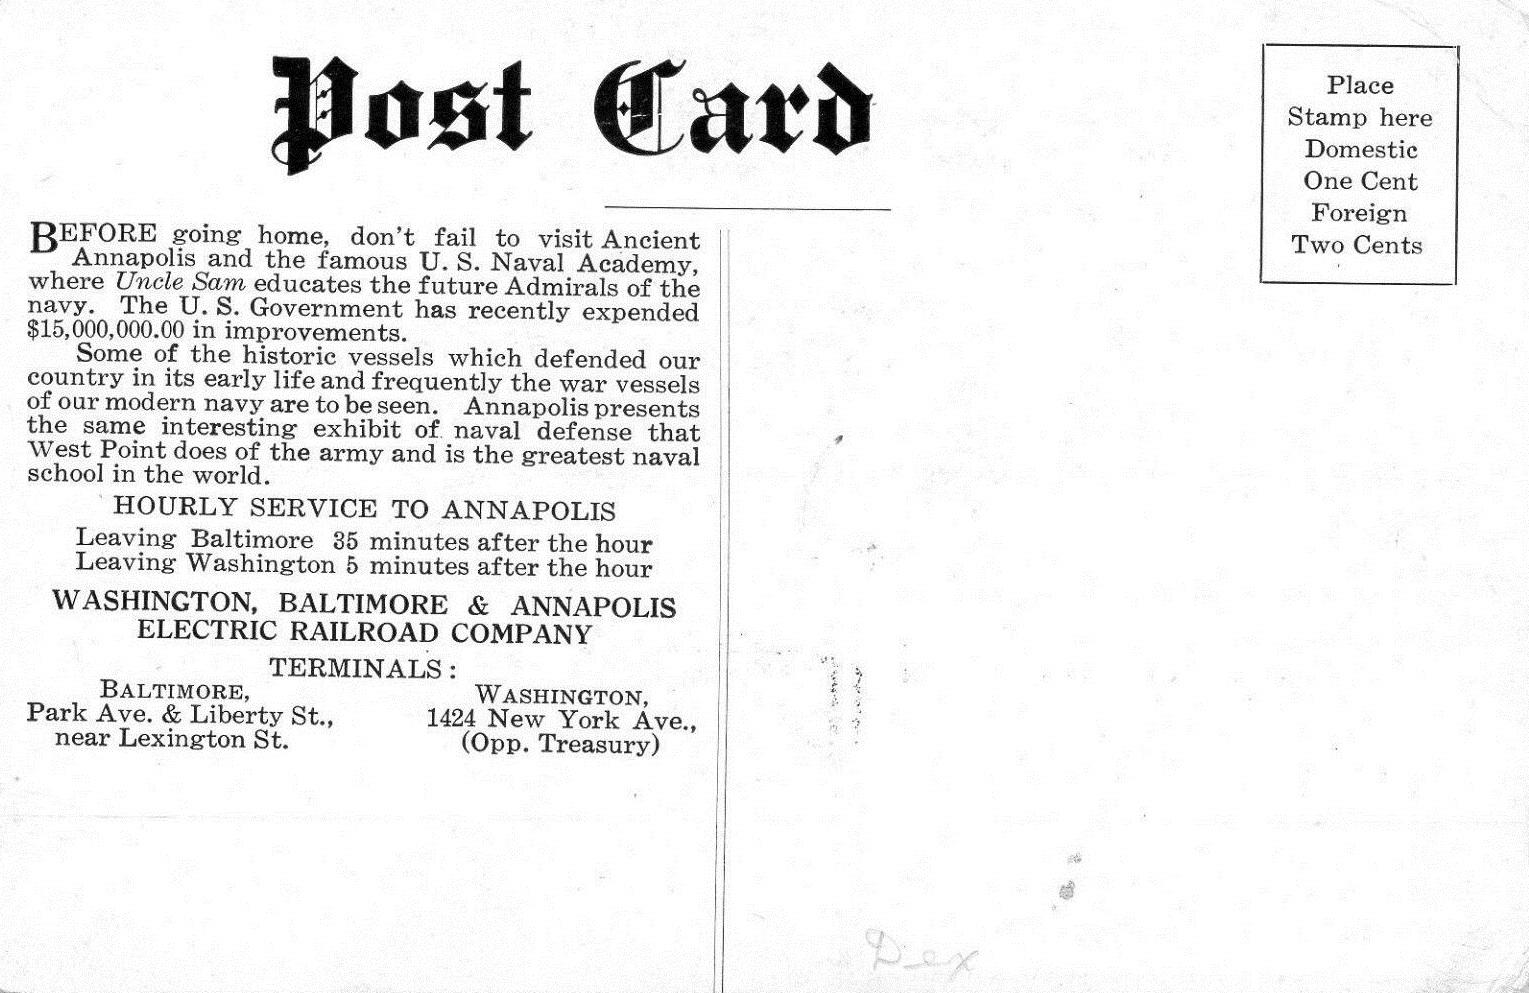 Washington-Baltimore-and-Annapolis-Railroad-Postcard-1-2.jpg